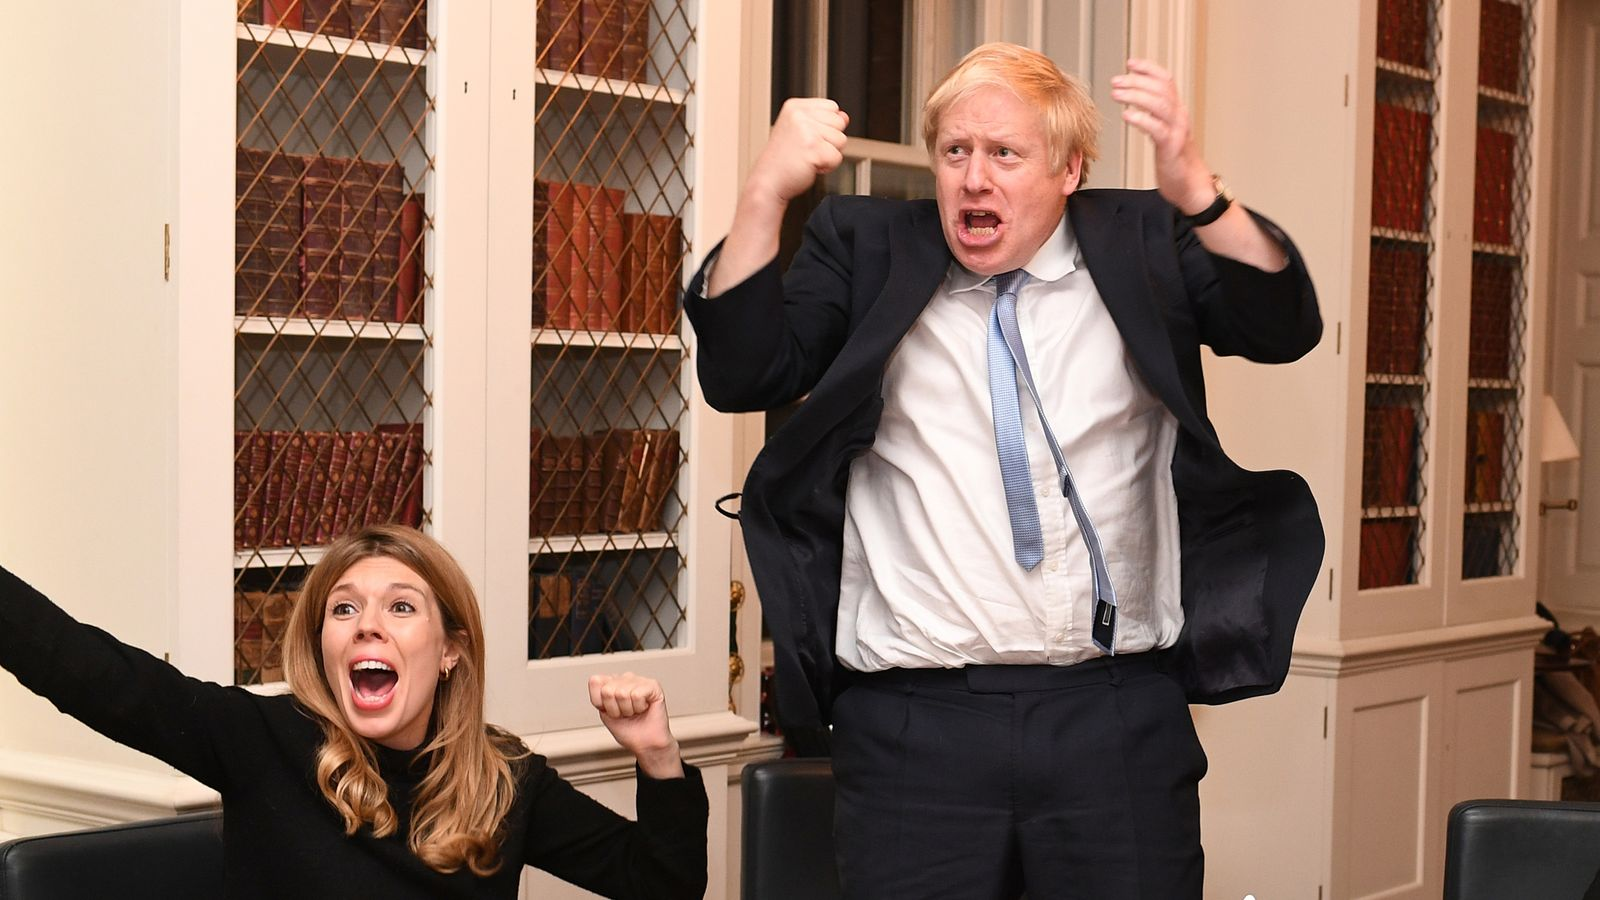 Johnson employs Cameron's 'vanity' photographer